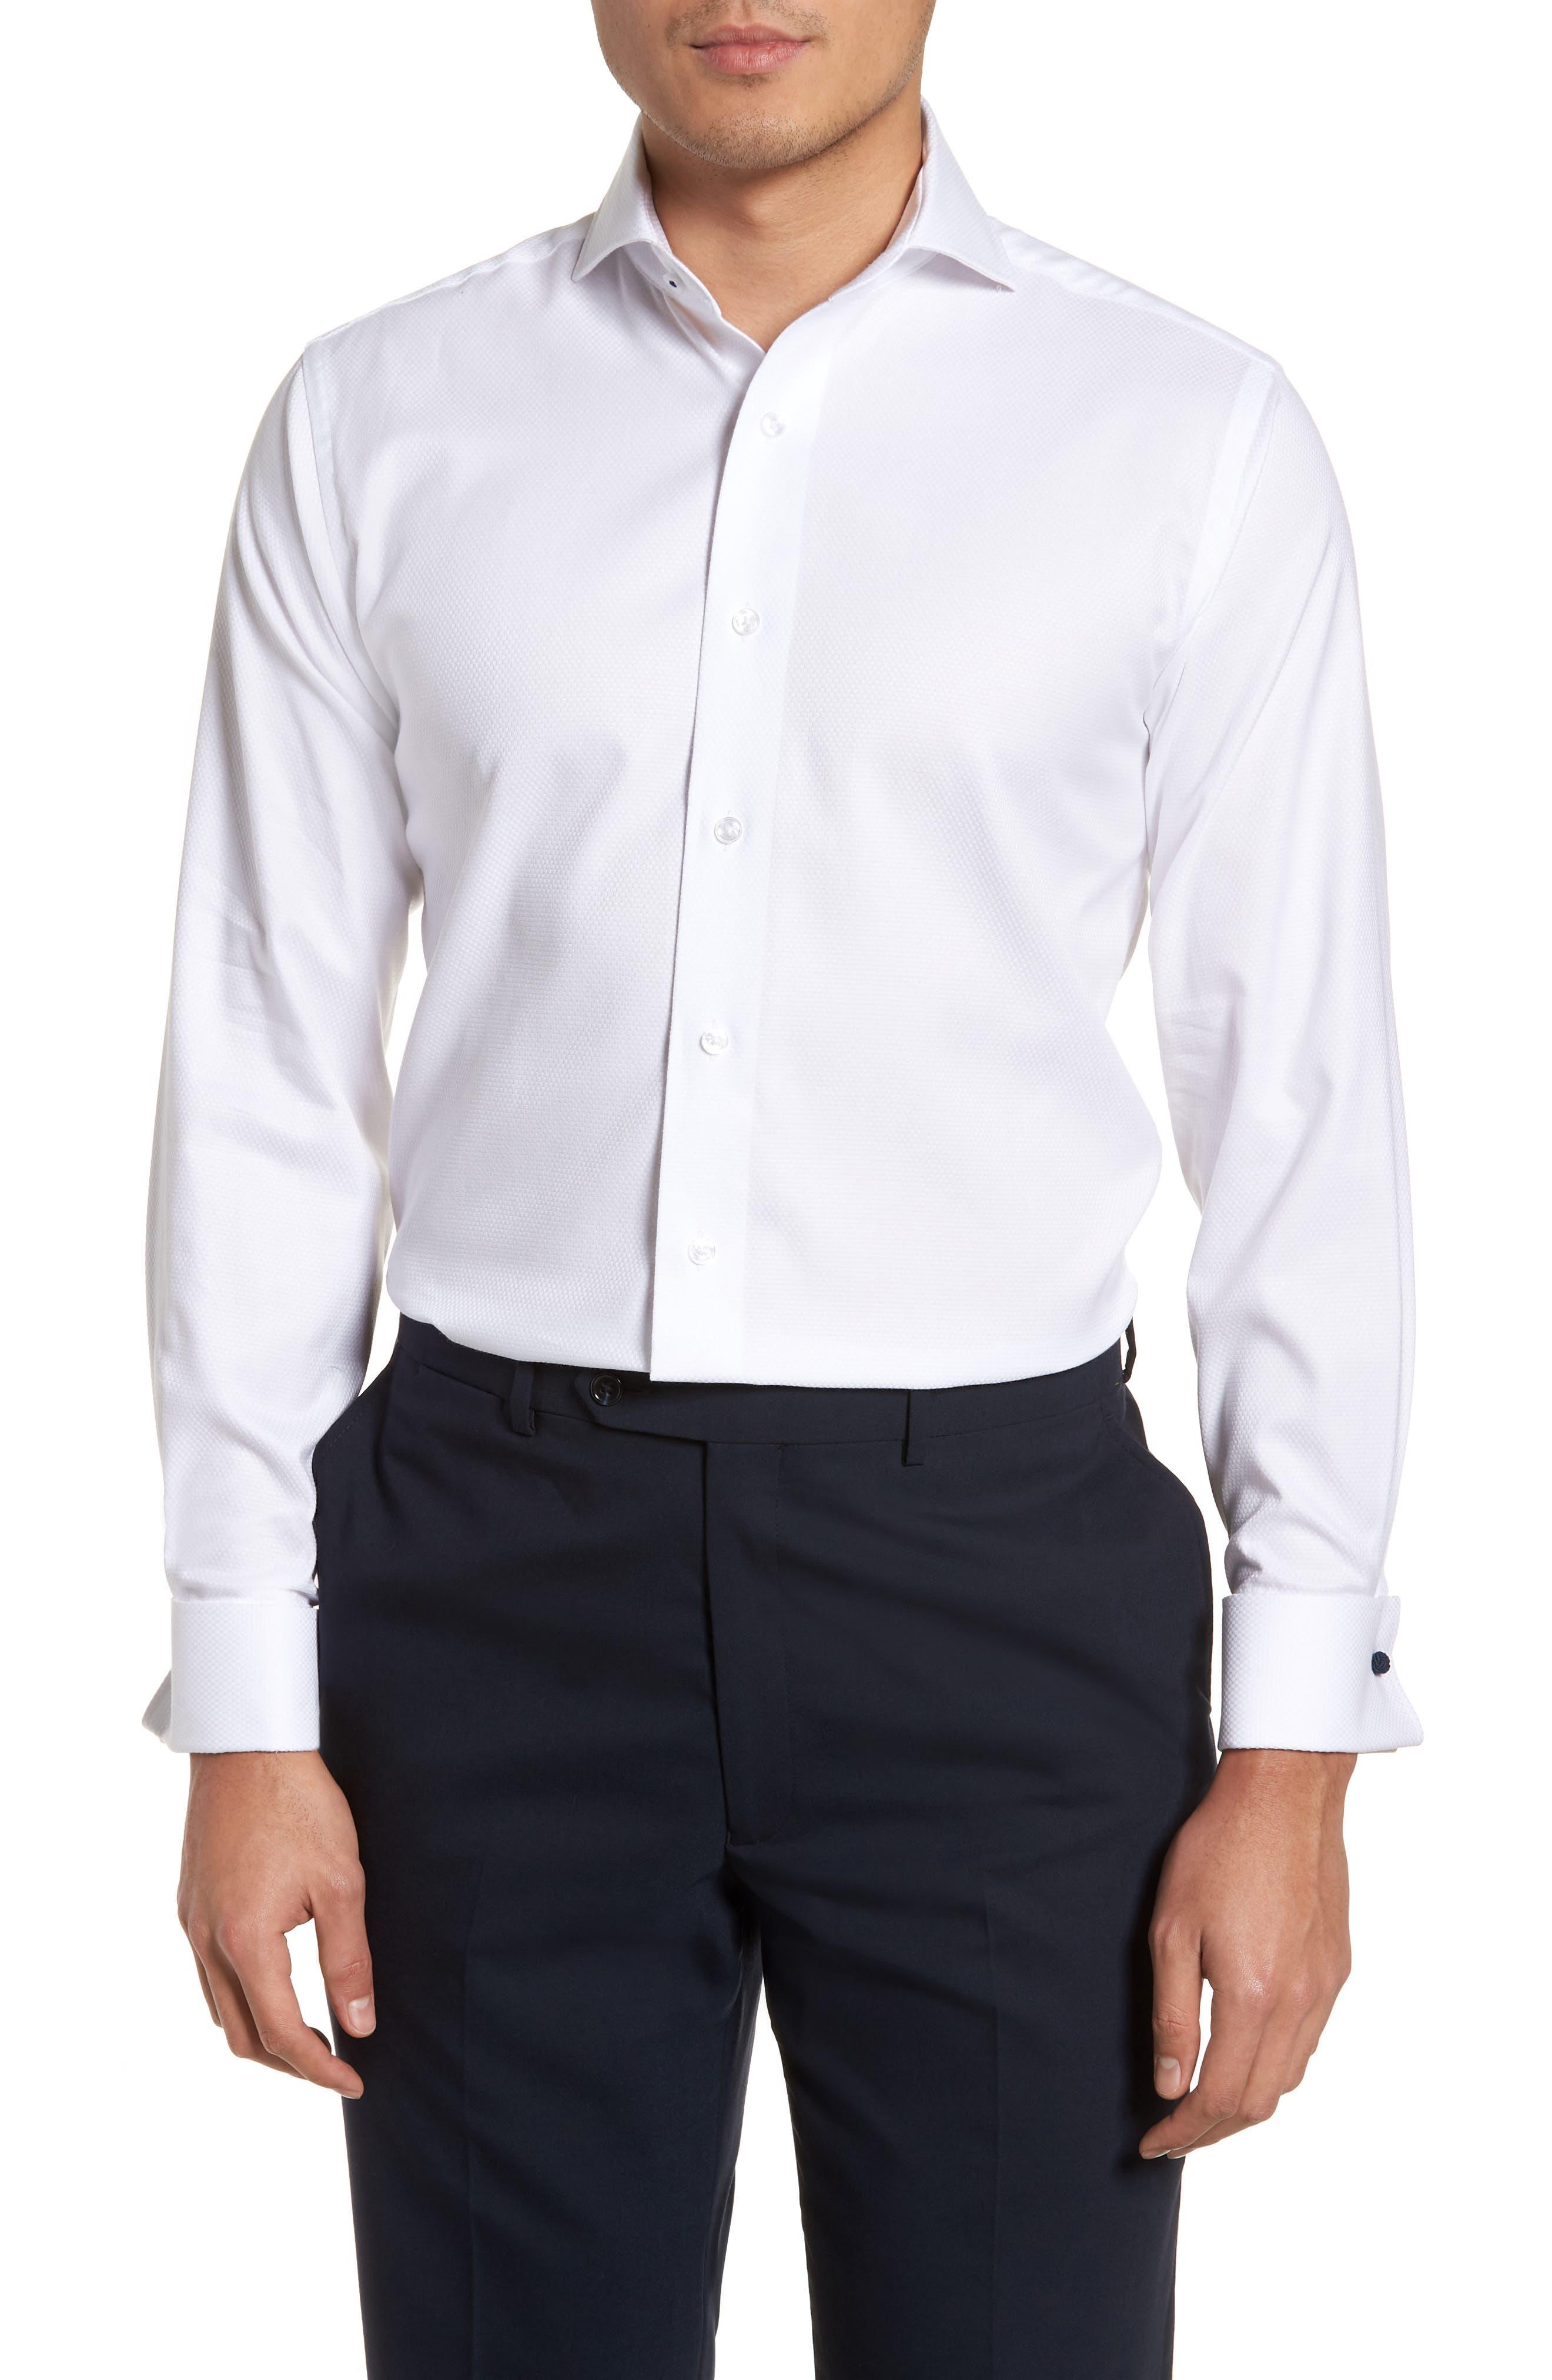 LORENZO UOMO Trim Fit Basket Weave Dress Shirt, Main, color, WHITE